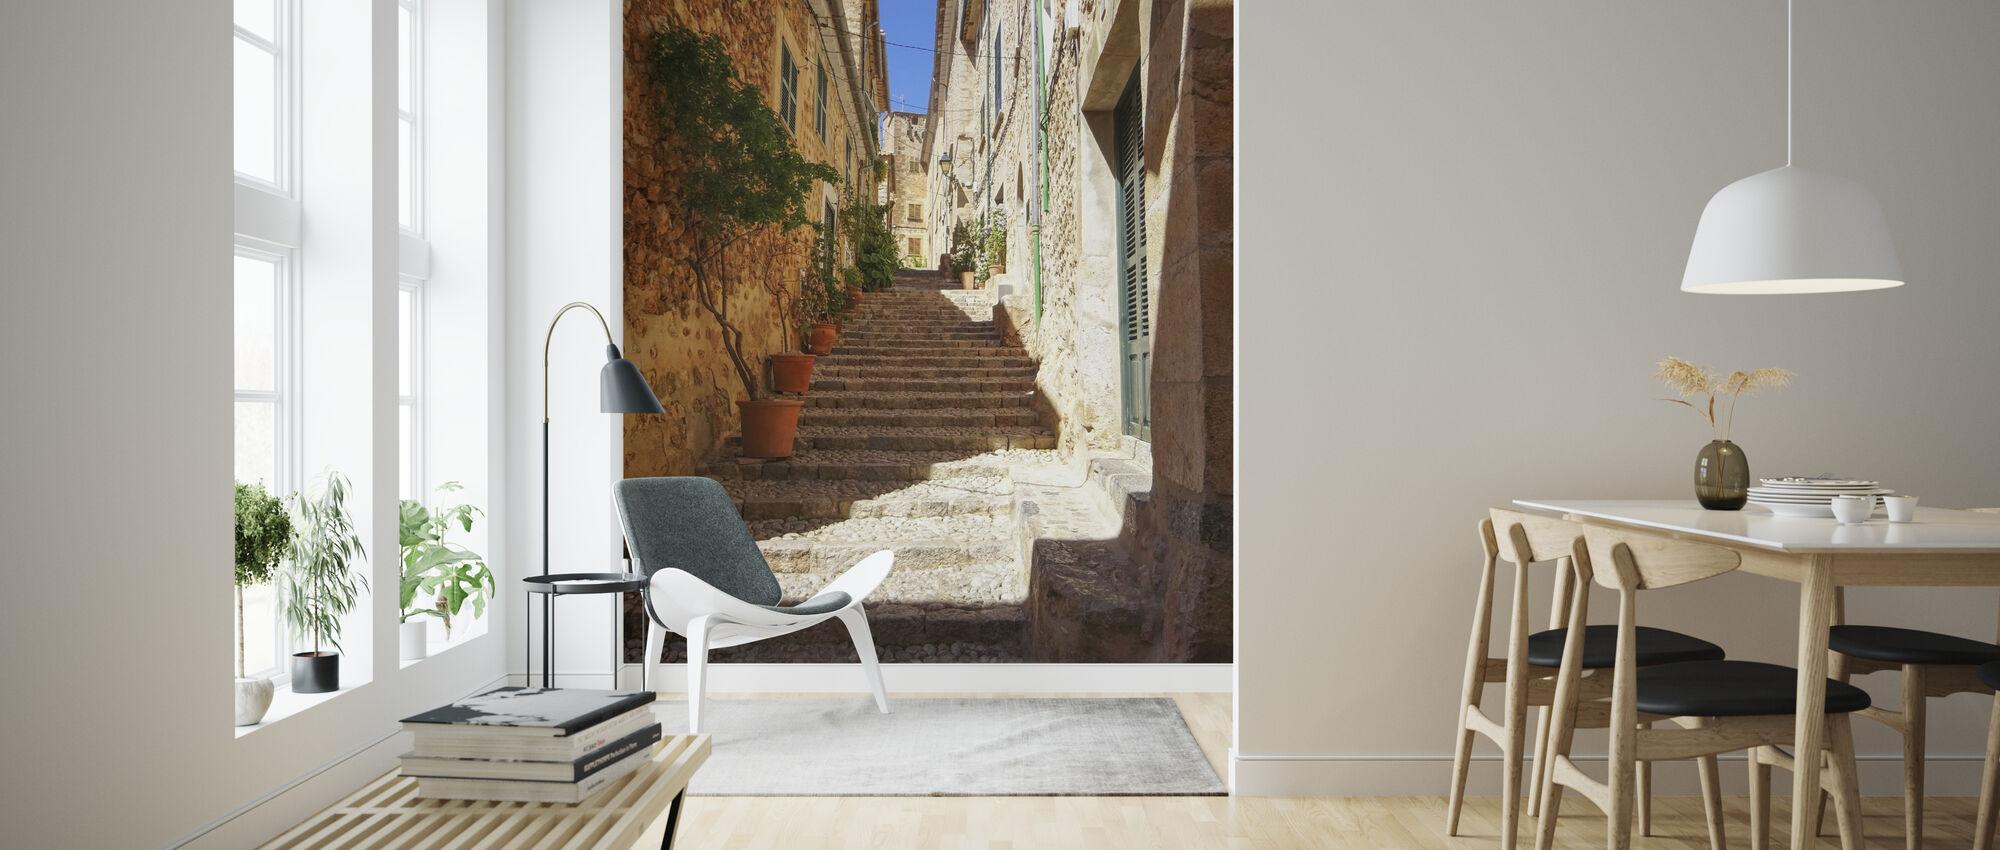 The Fornalutx - Wallpaper - Living Room